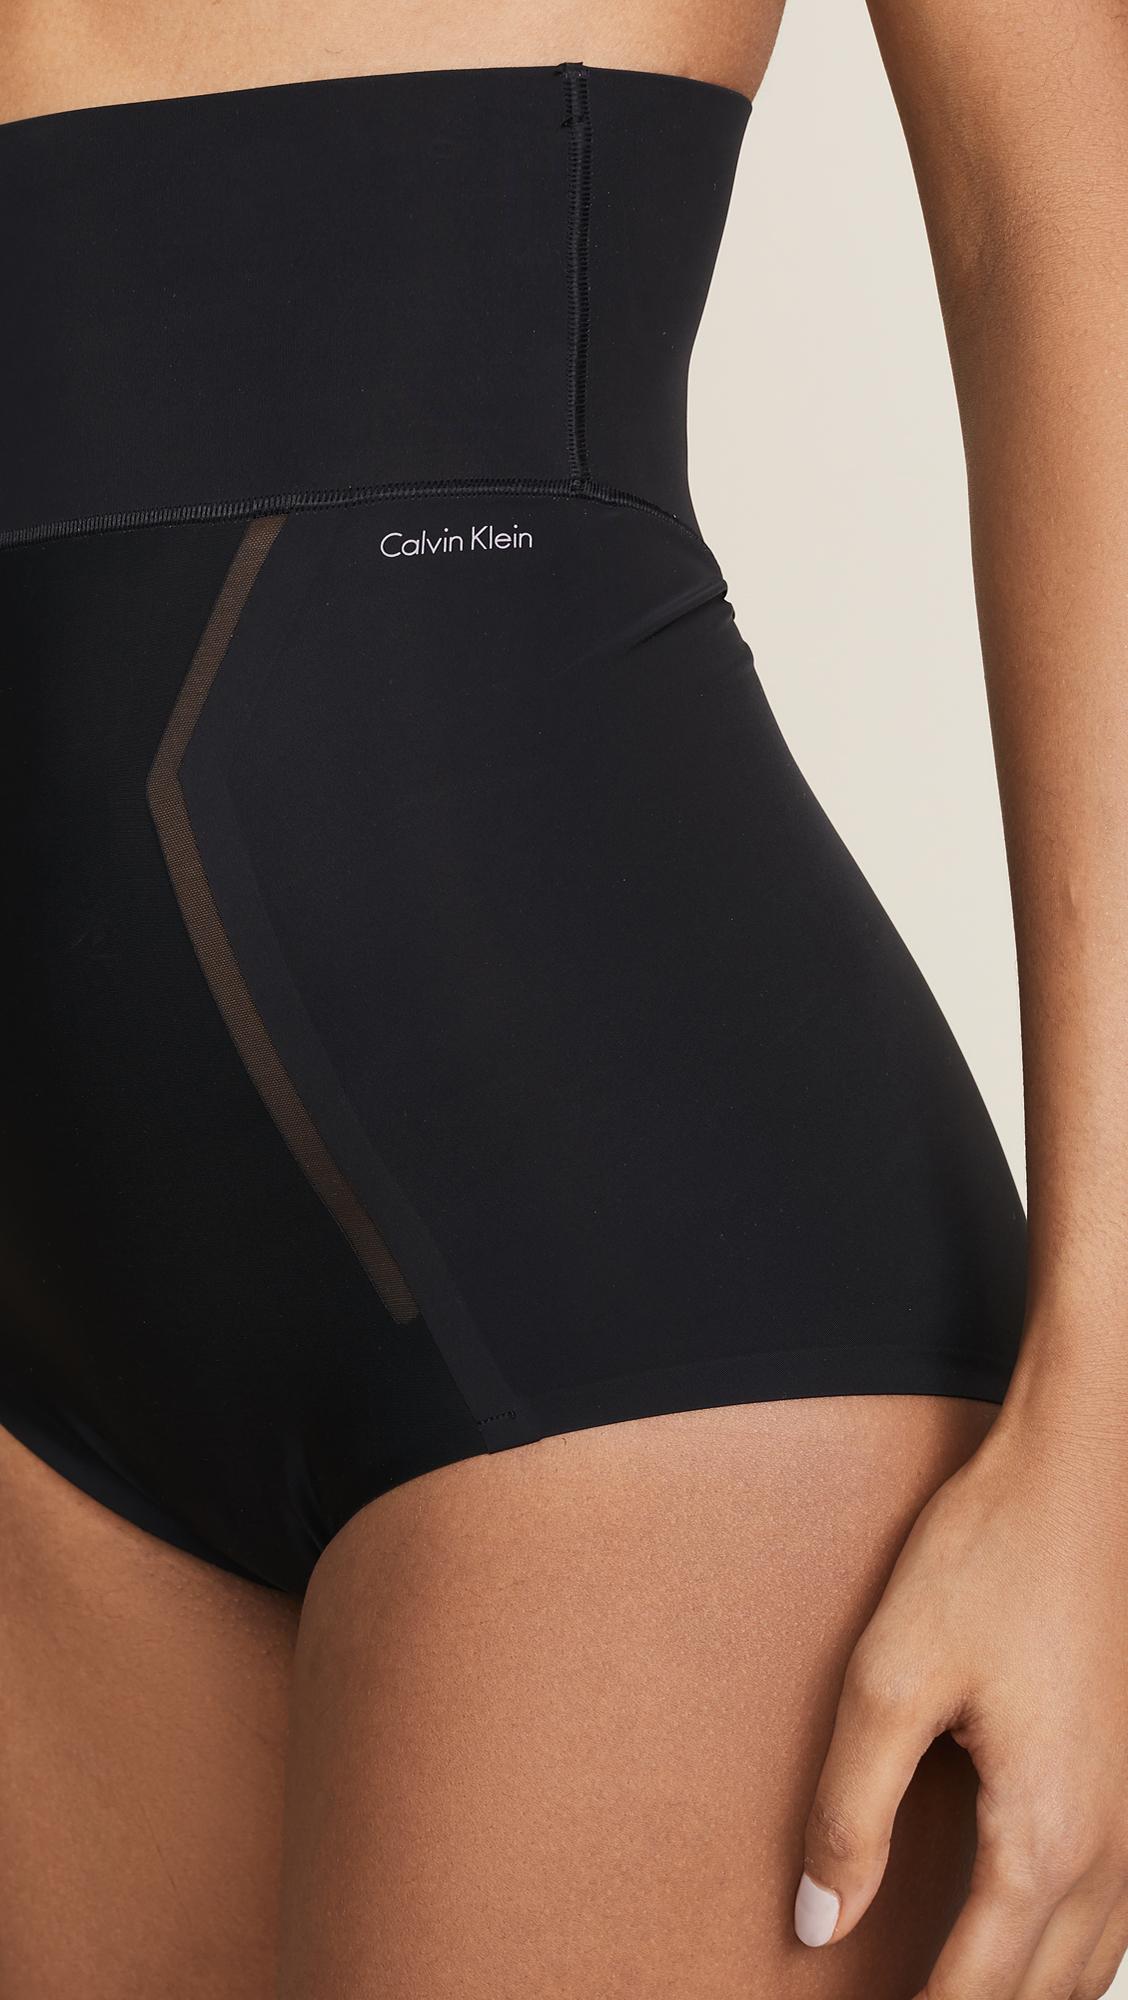 1cb5bd6aaa Calvin Klein Underwear Sculpted Shapewear High Waist Briefs